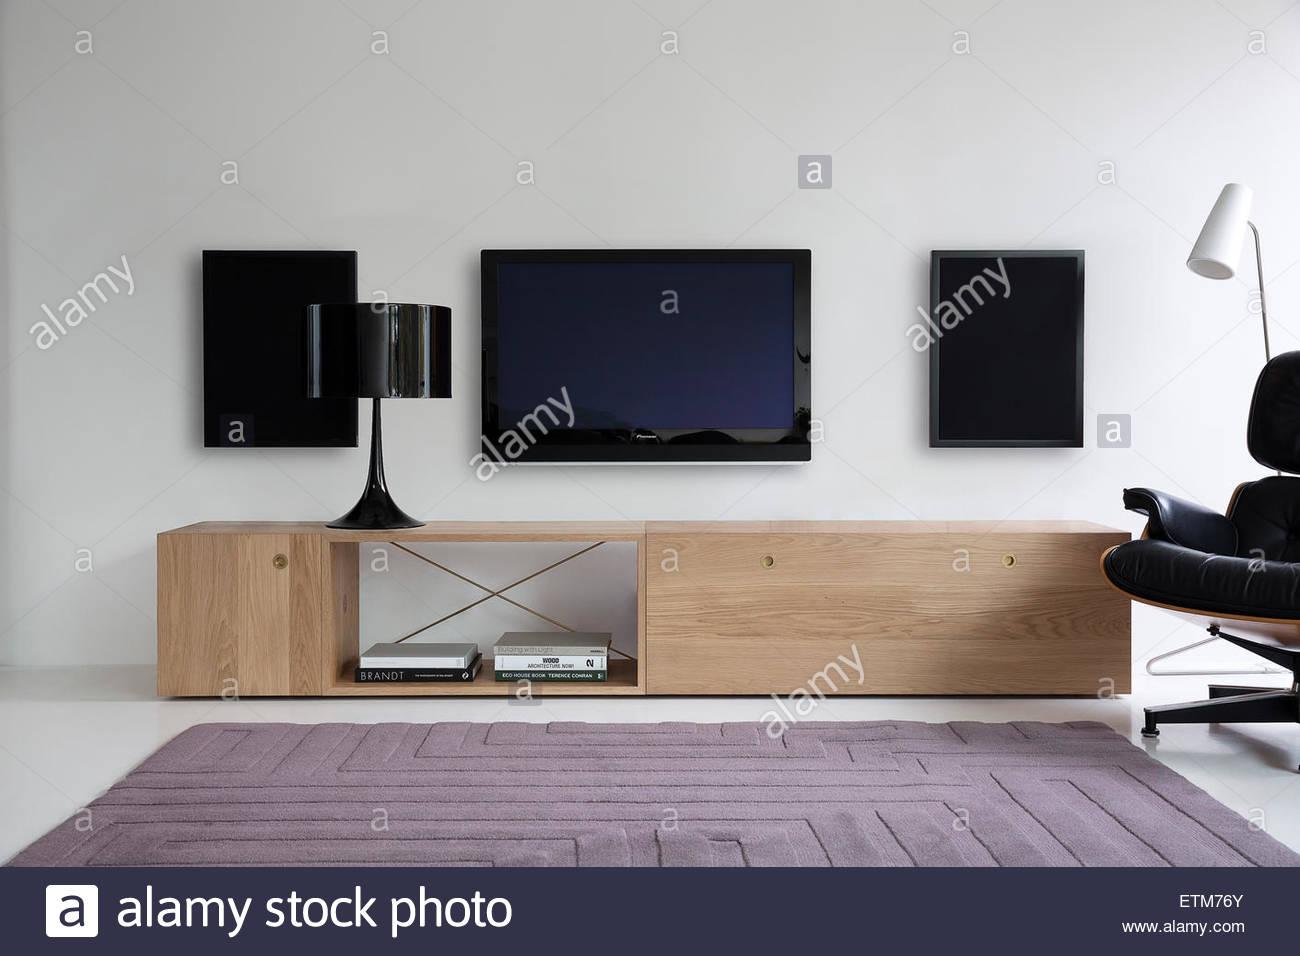 Modular Furniture in the living room Beynon London United